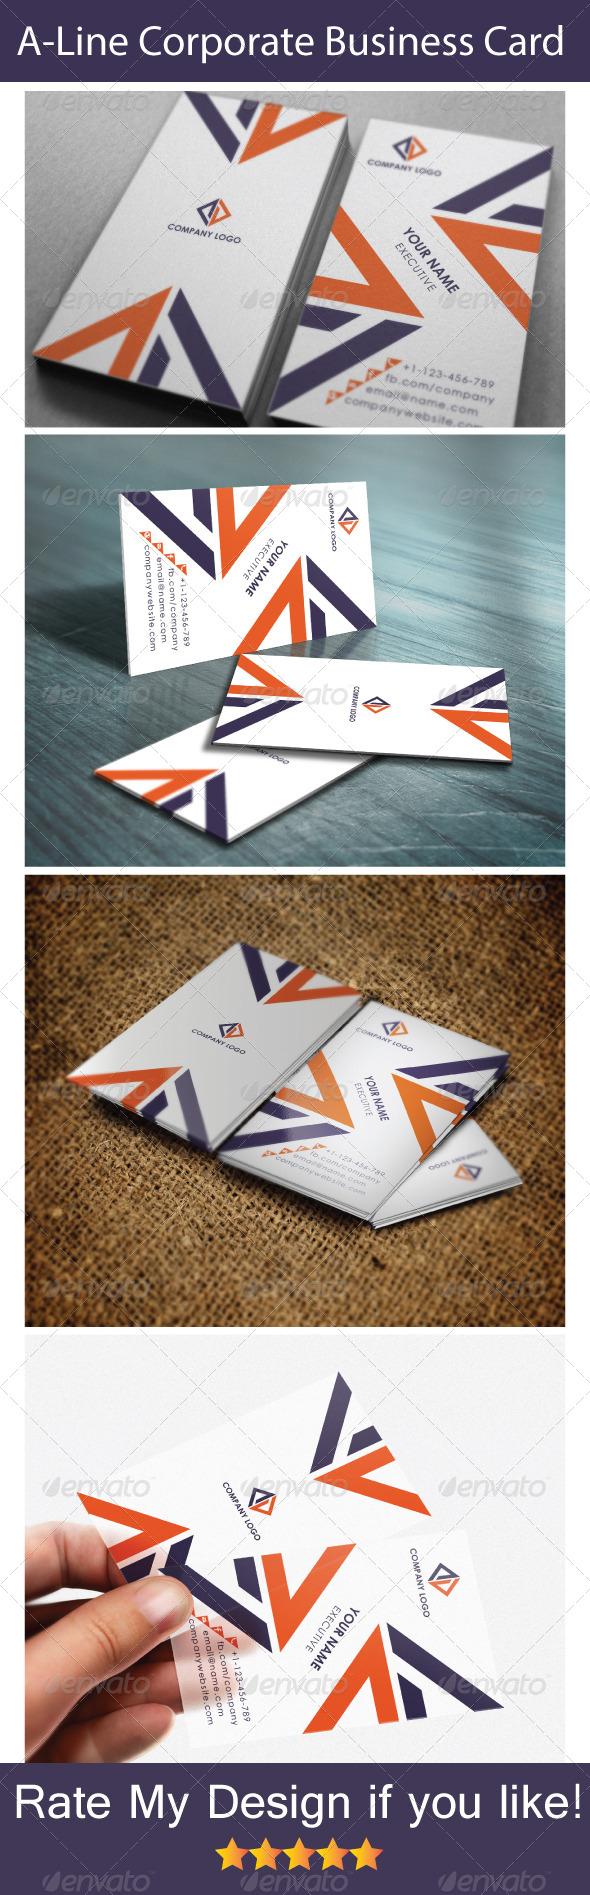 A Line Corporative Business Card